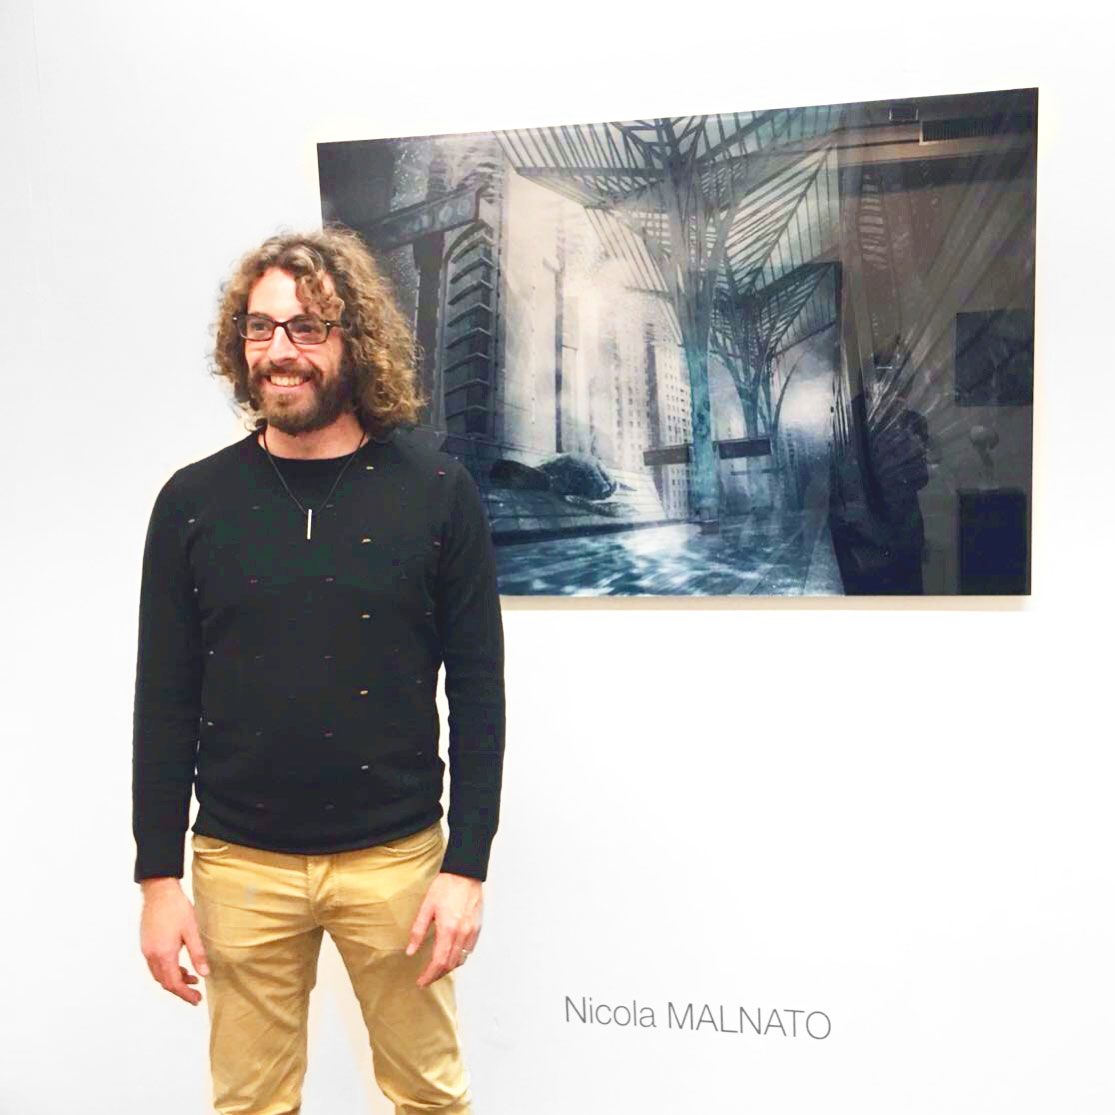 Nicola Malnato